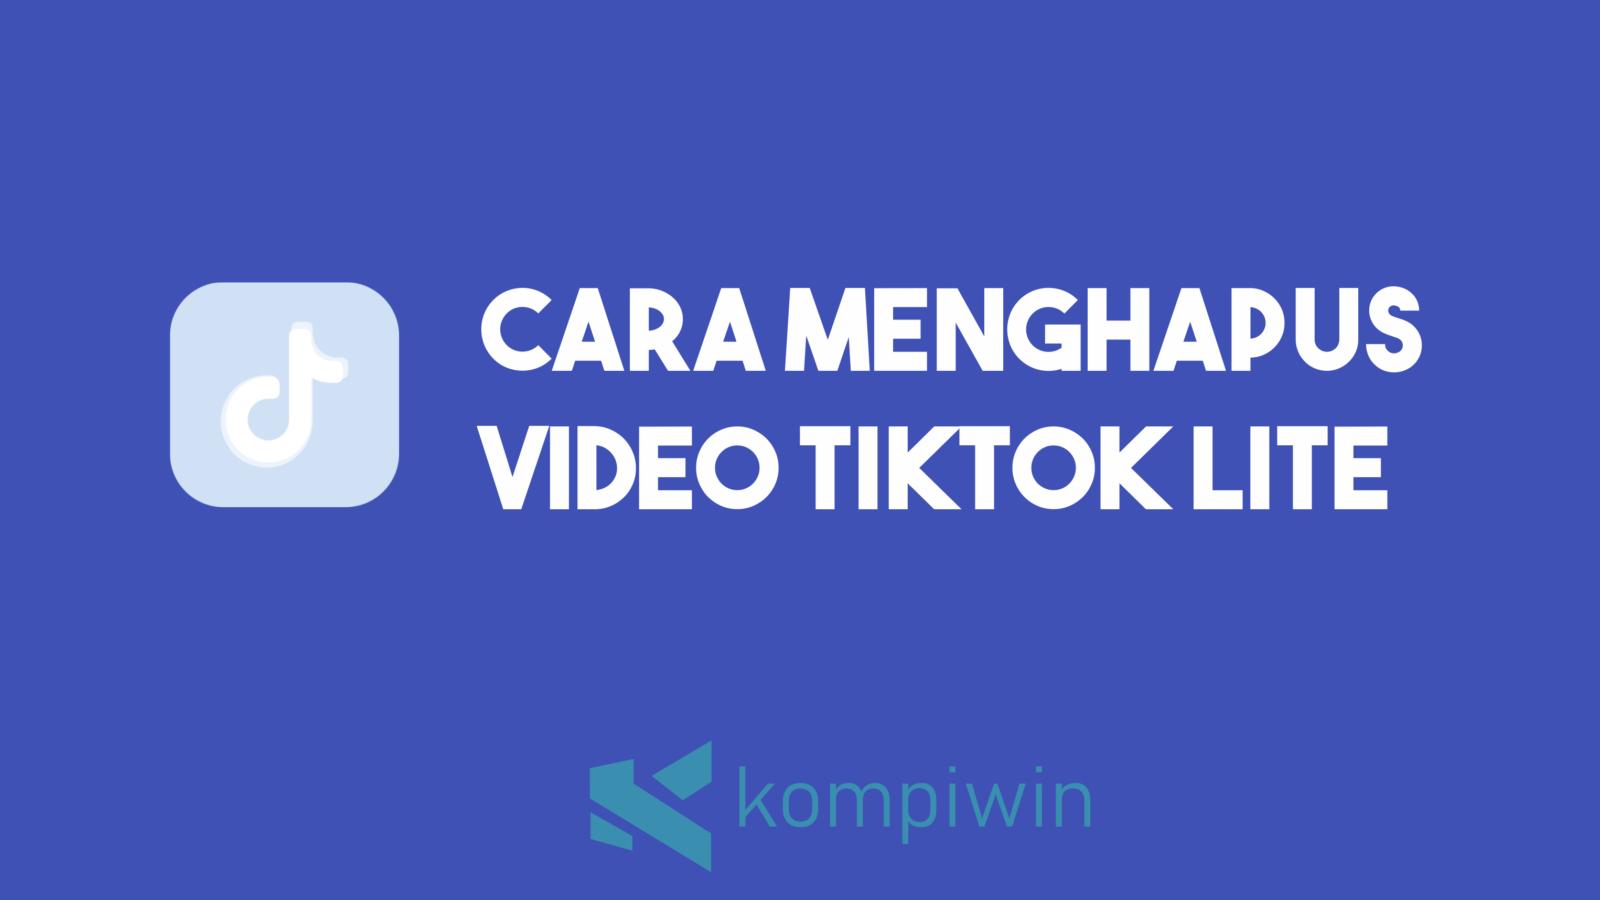 Cara Menghapus Video TikTok Lite 7